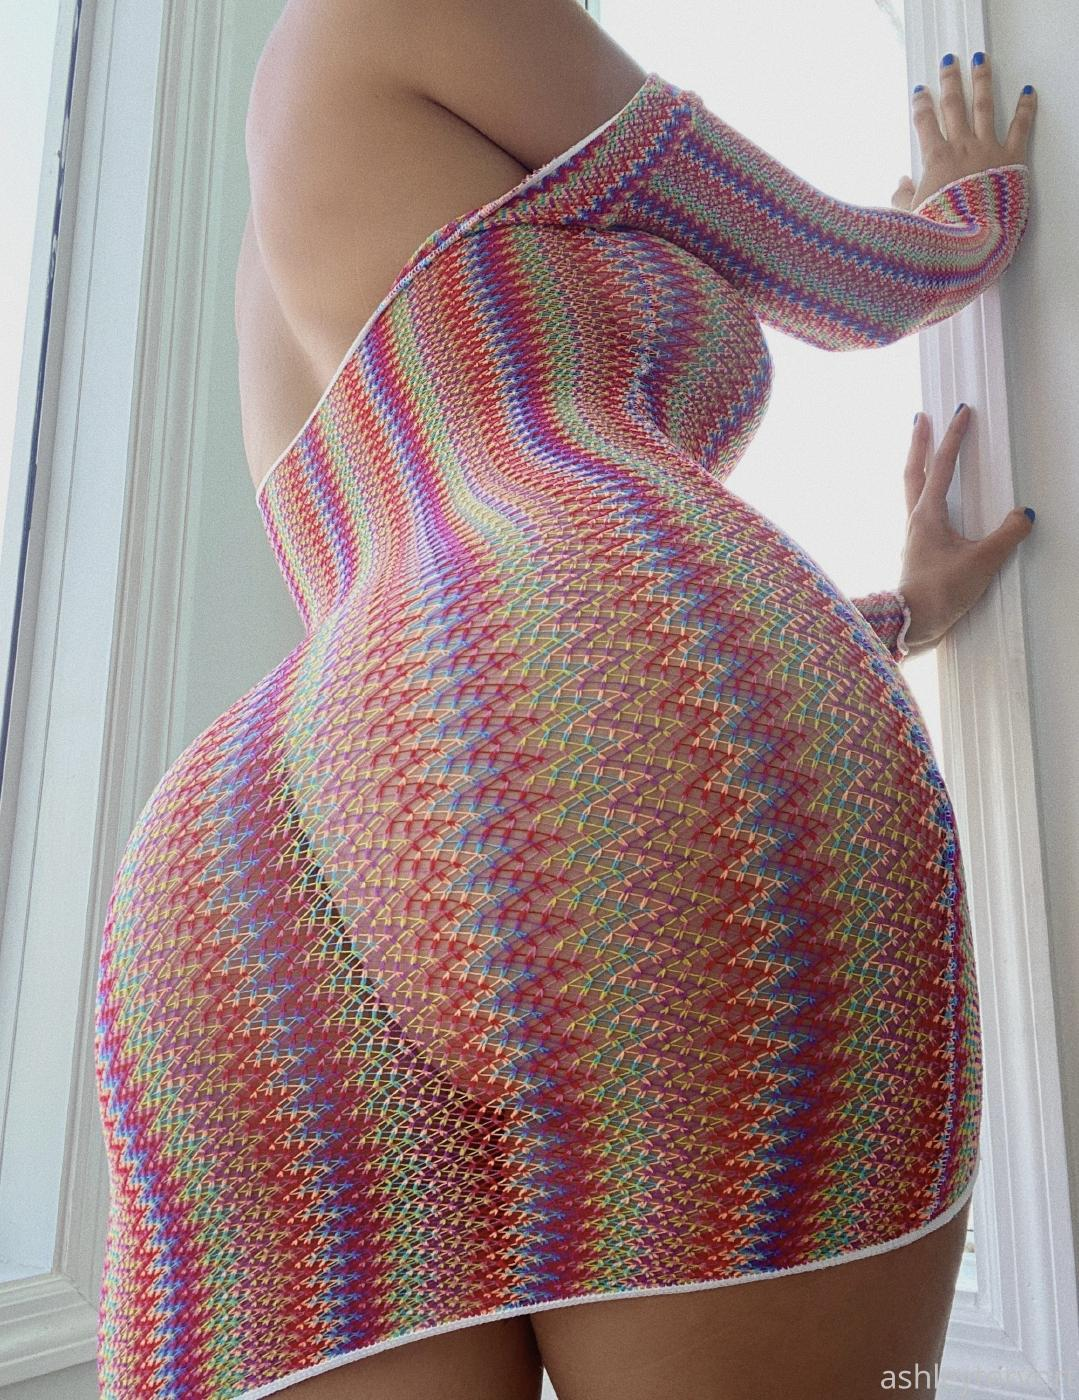 Ashley Tervort See Through Fishnet Dress Onlyfans Leaked 7